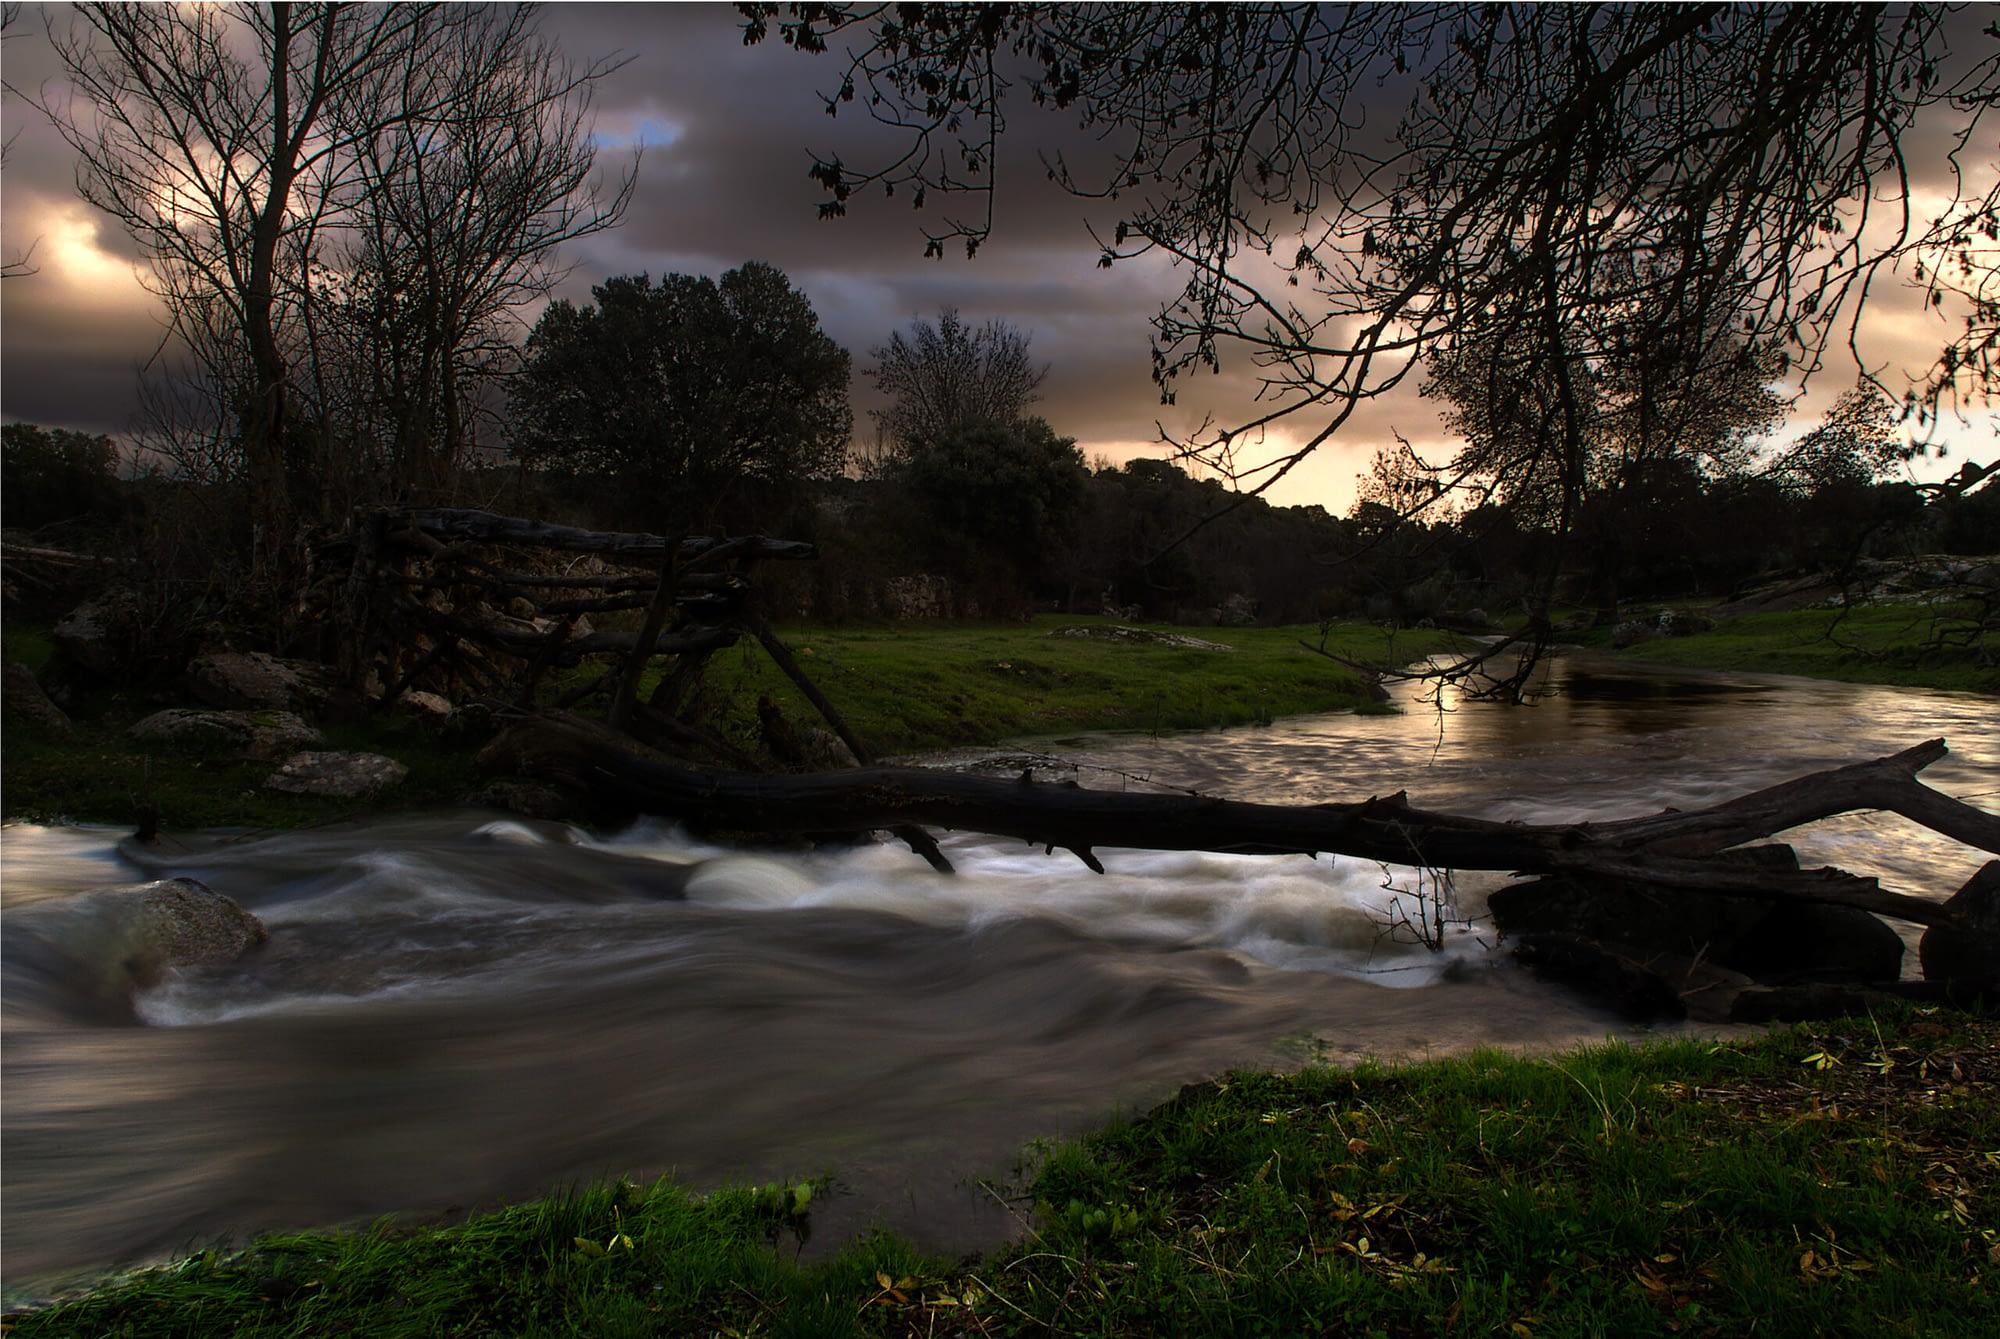 Pelahustán Dic - Landscape Photography by Jose Luis Durante Molina